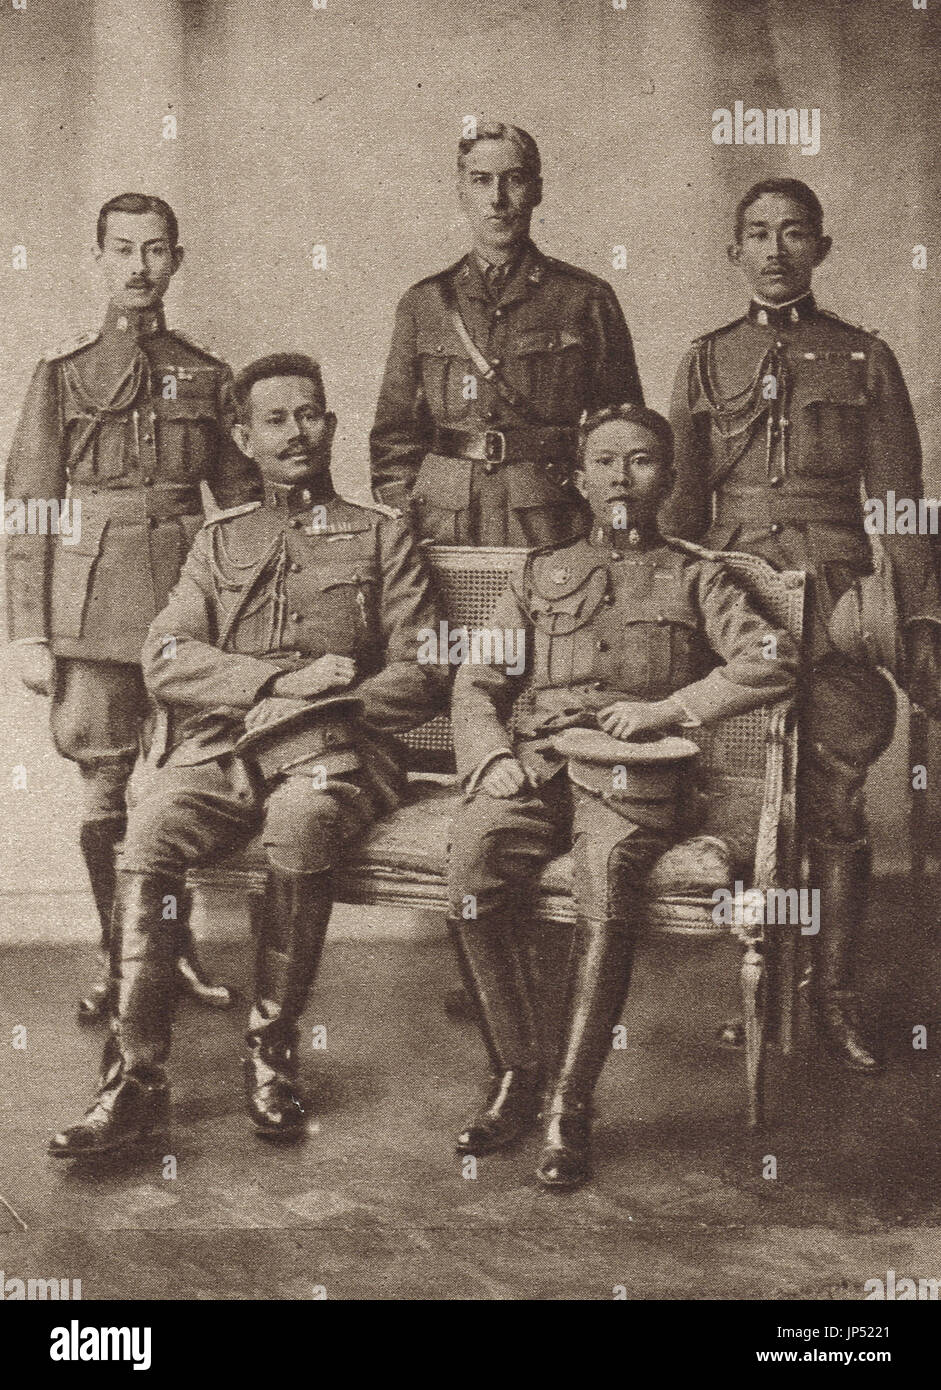 Chinese Cavalrymen on scouting duties, ww1 - Stock Image